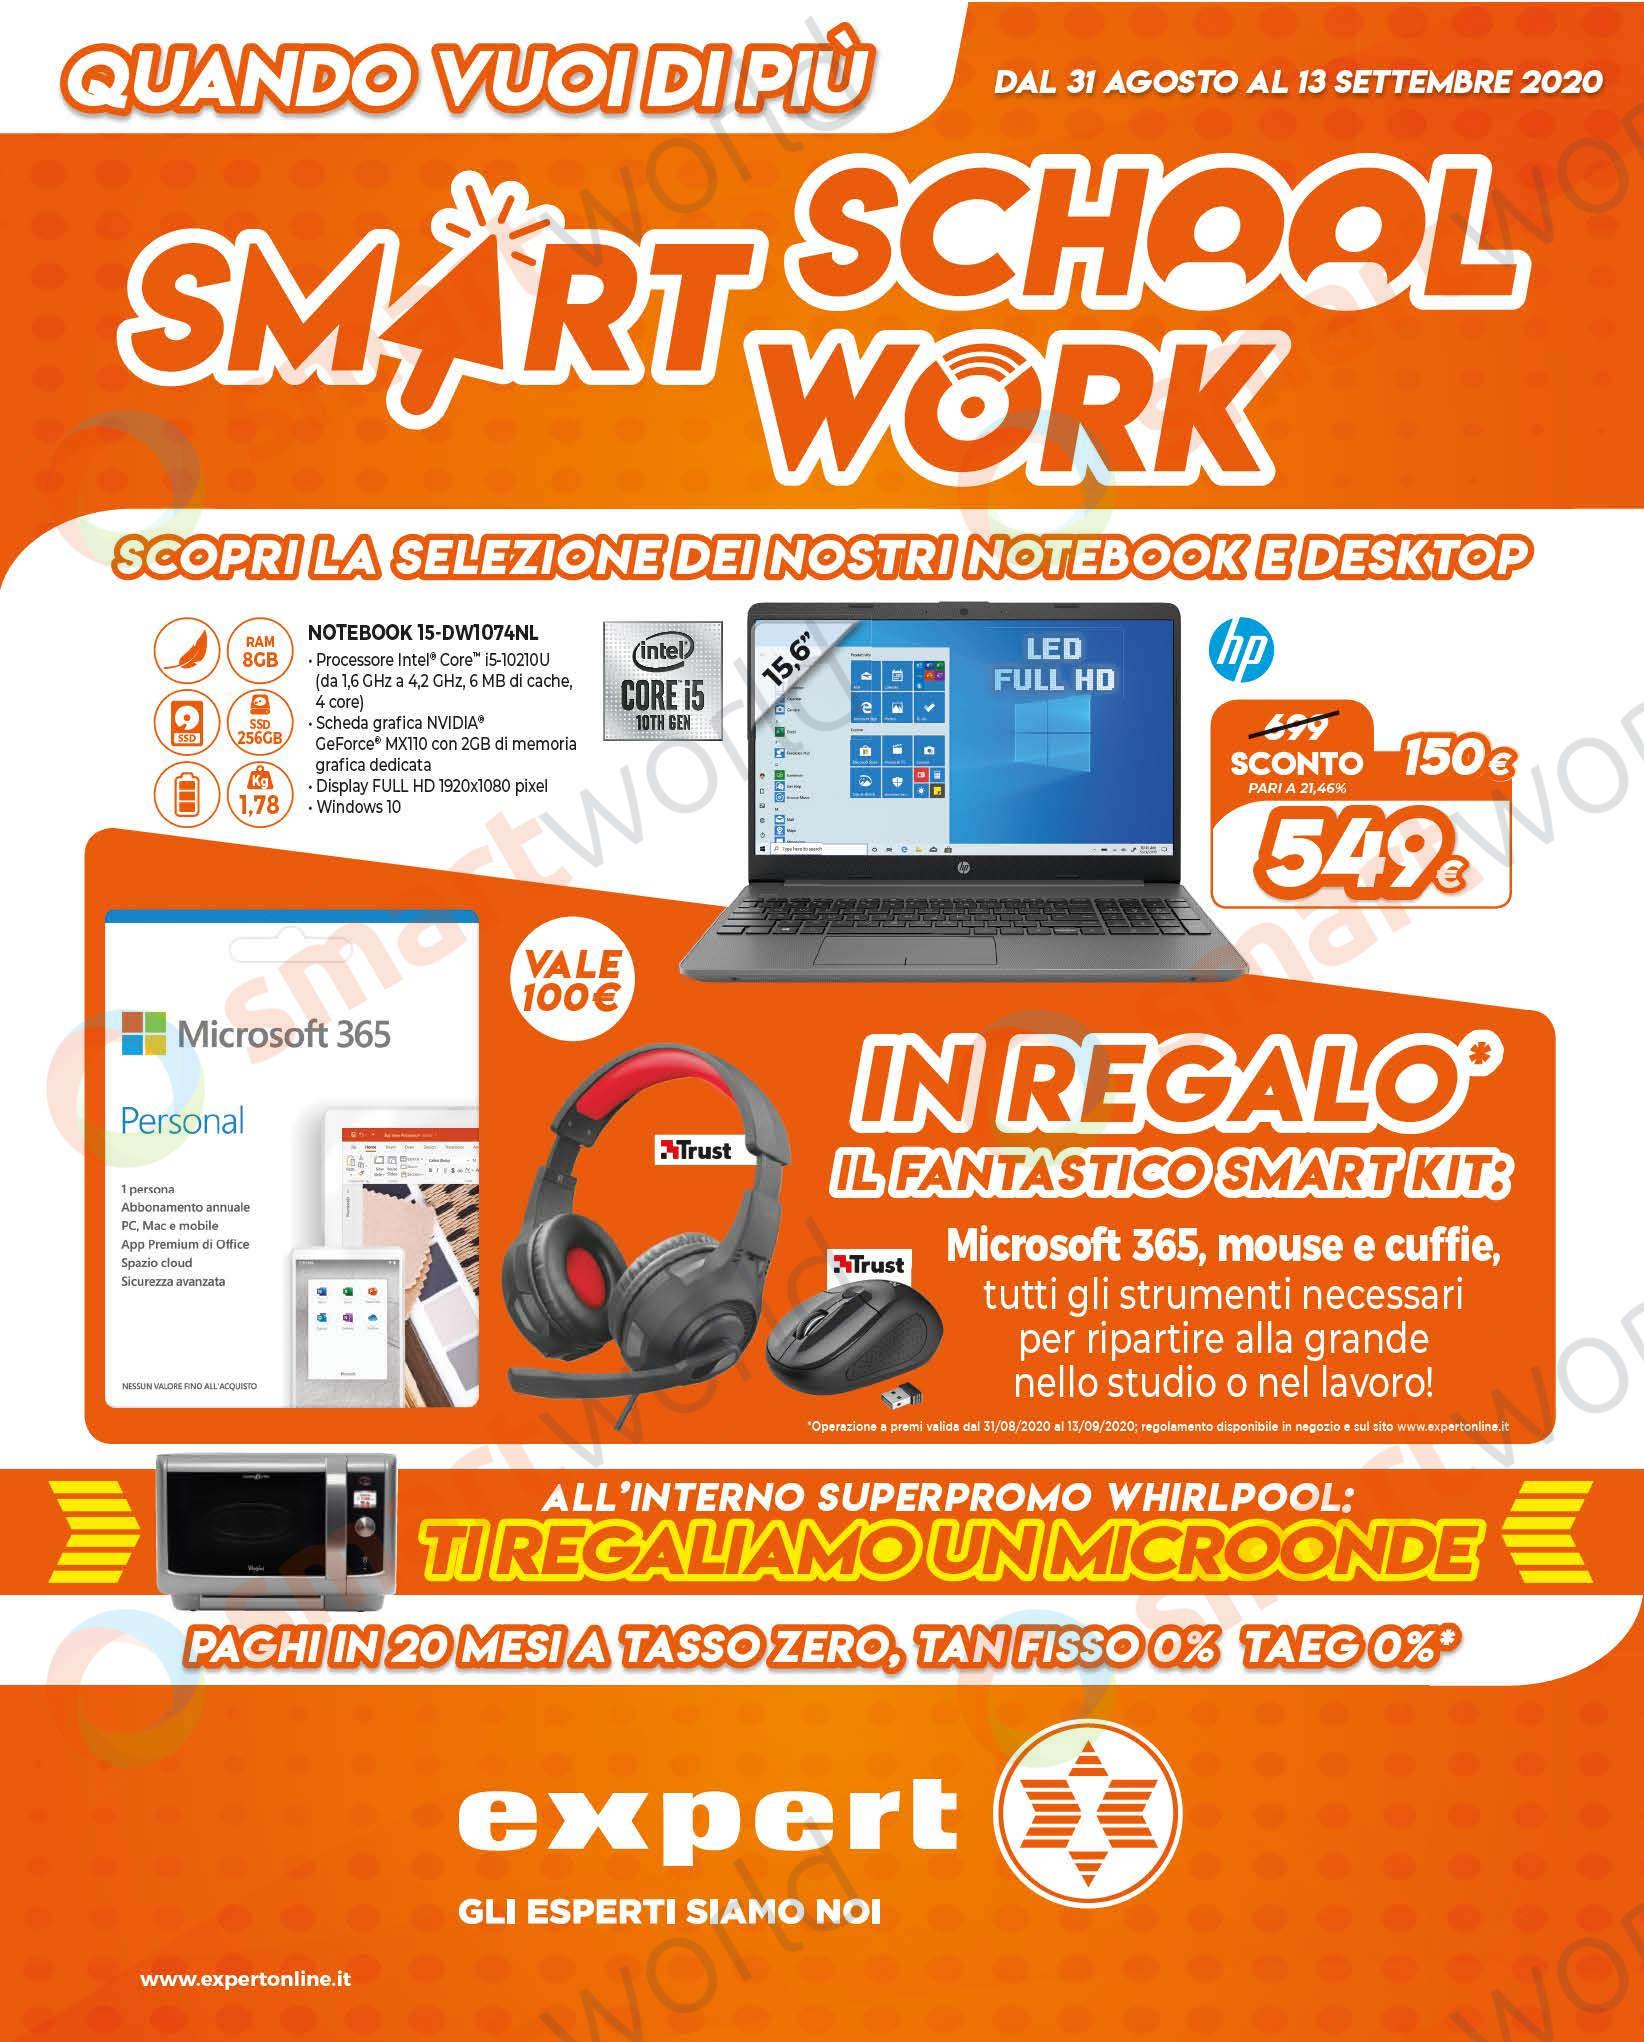 Volantino Expert Smart School Work 31 ago – 13 set 2020 (1)